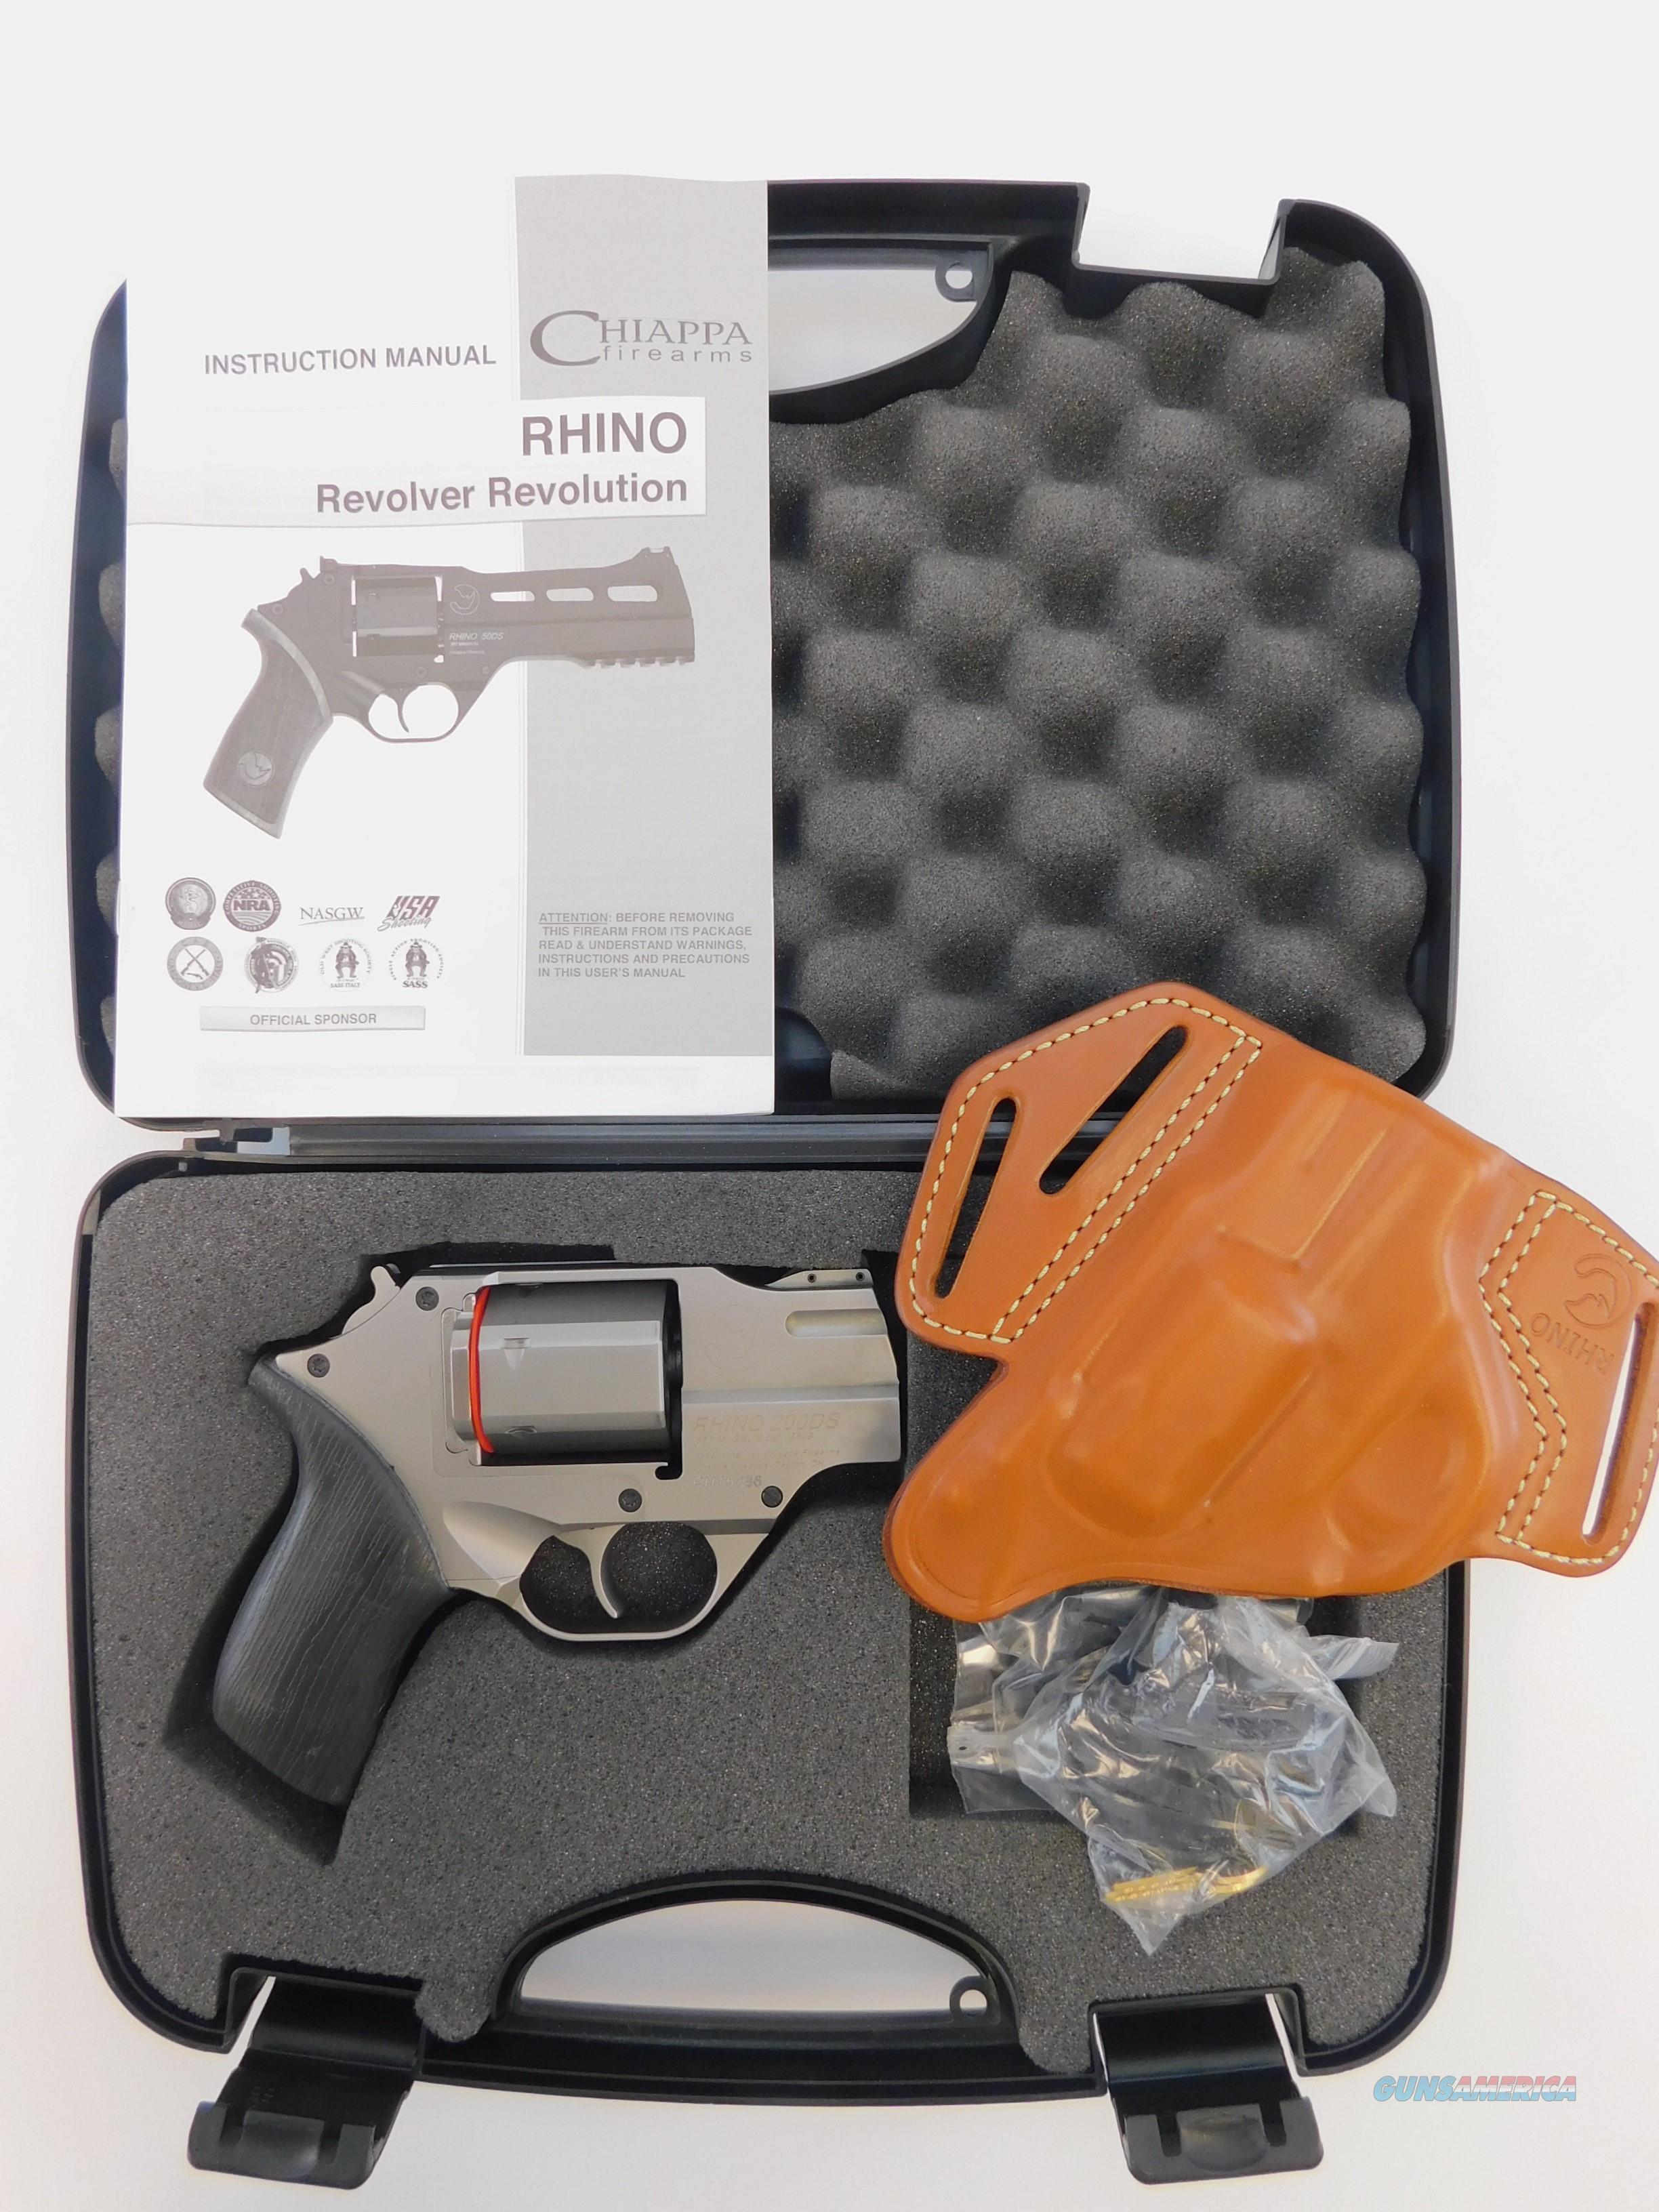 Chiappa rhino for sale